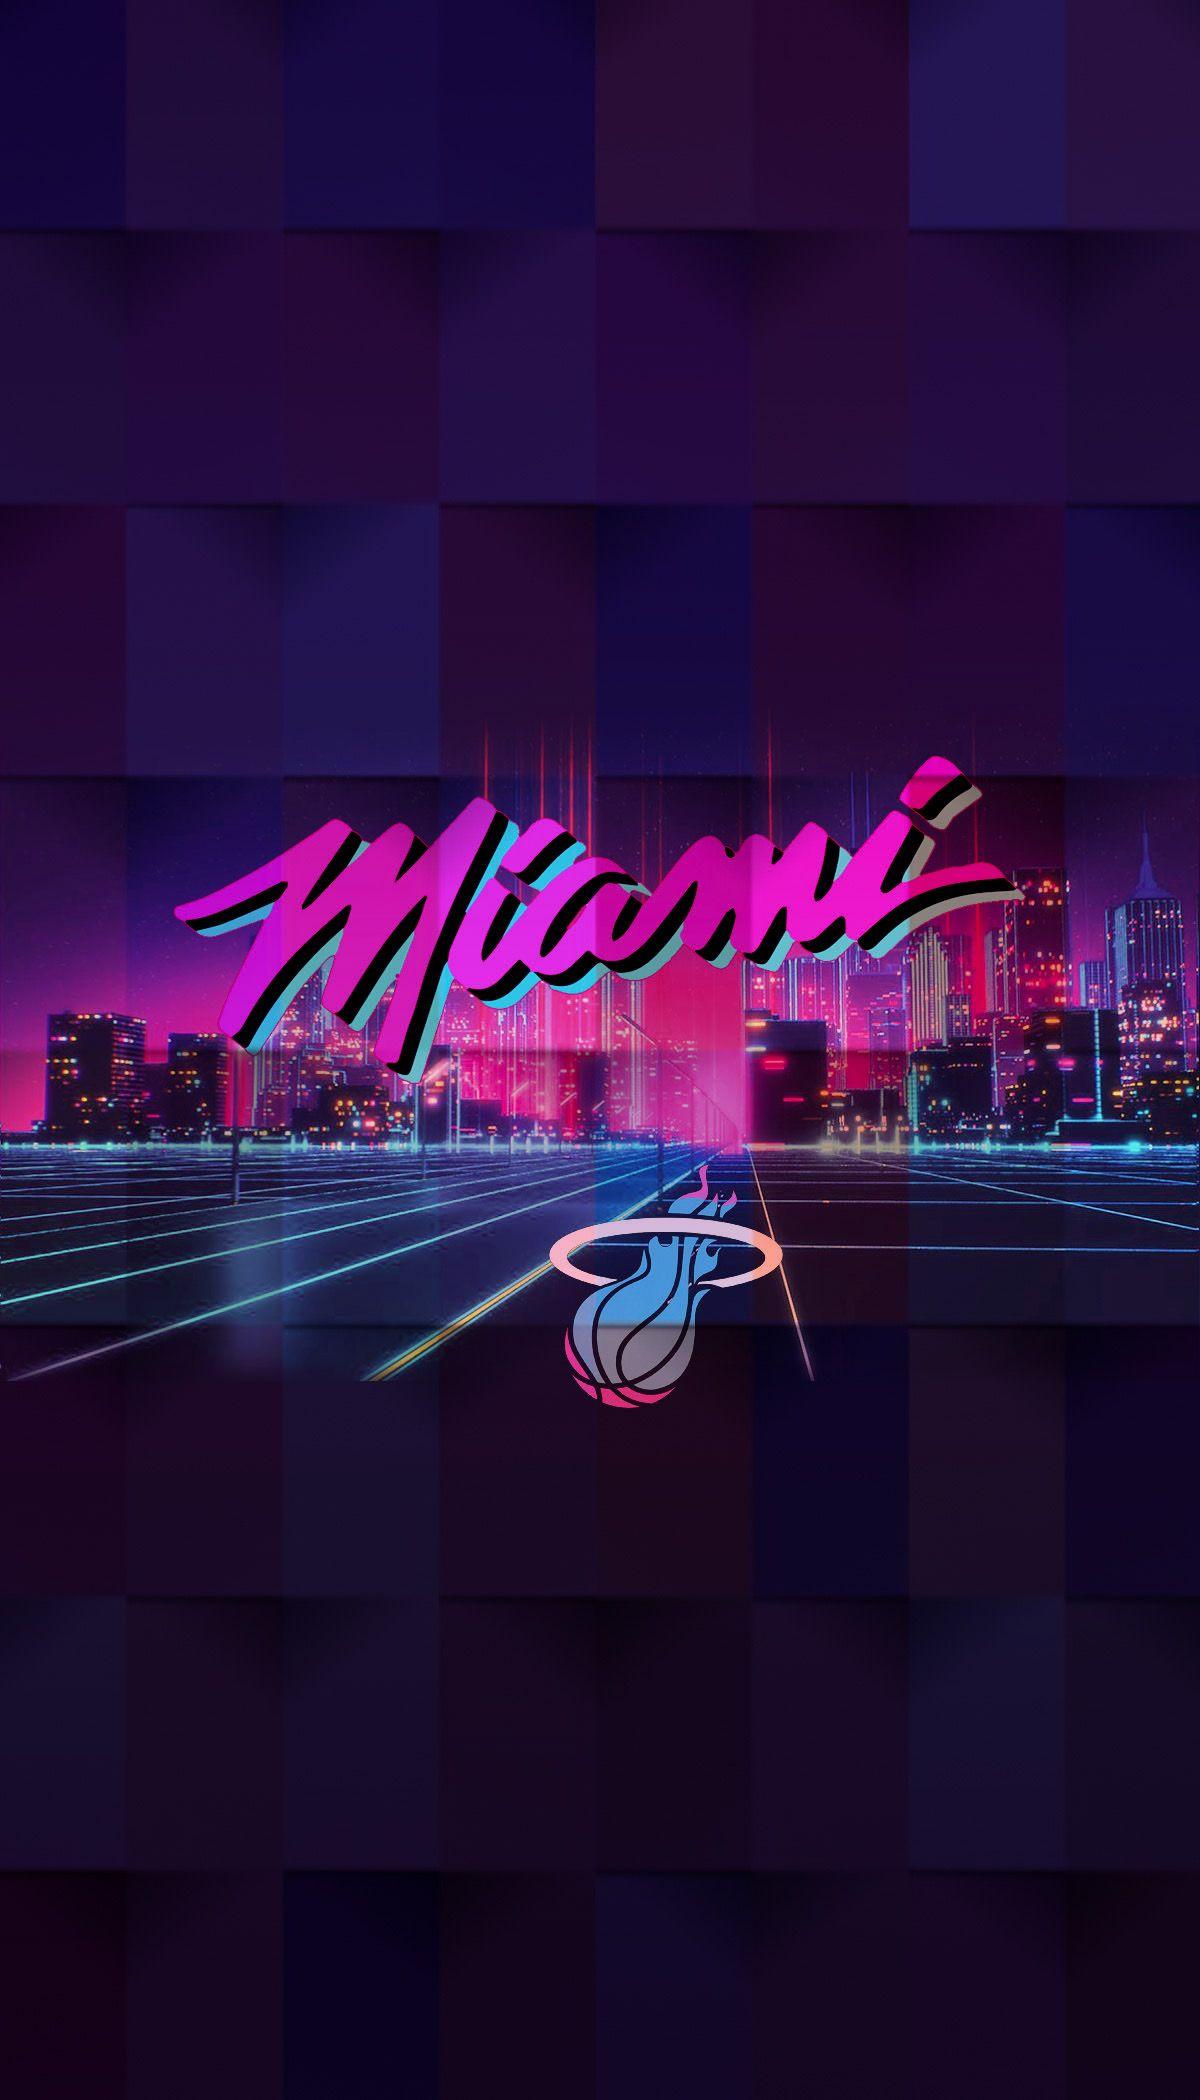 Miami Heat Wallpaper Nba Wallpapers Miami Heat Basketball Miami Heat